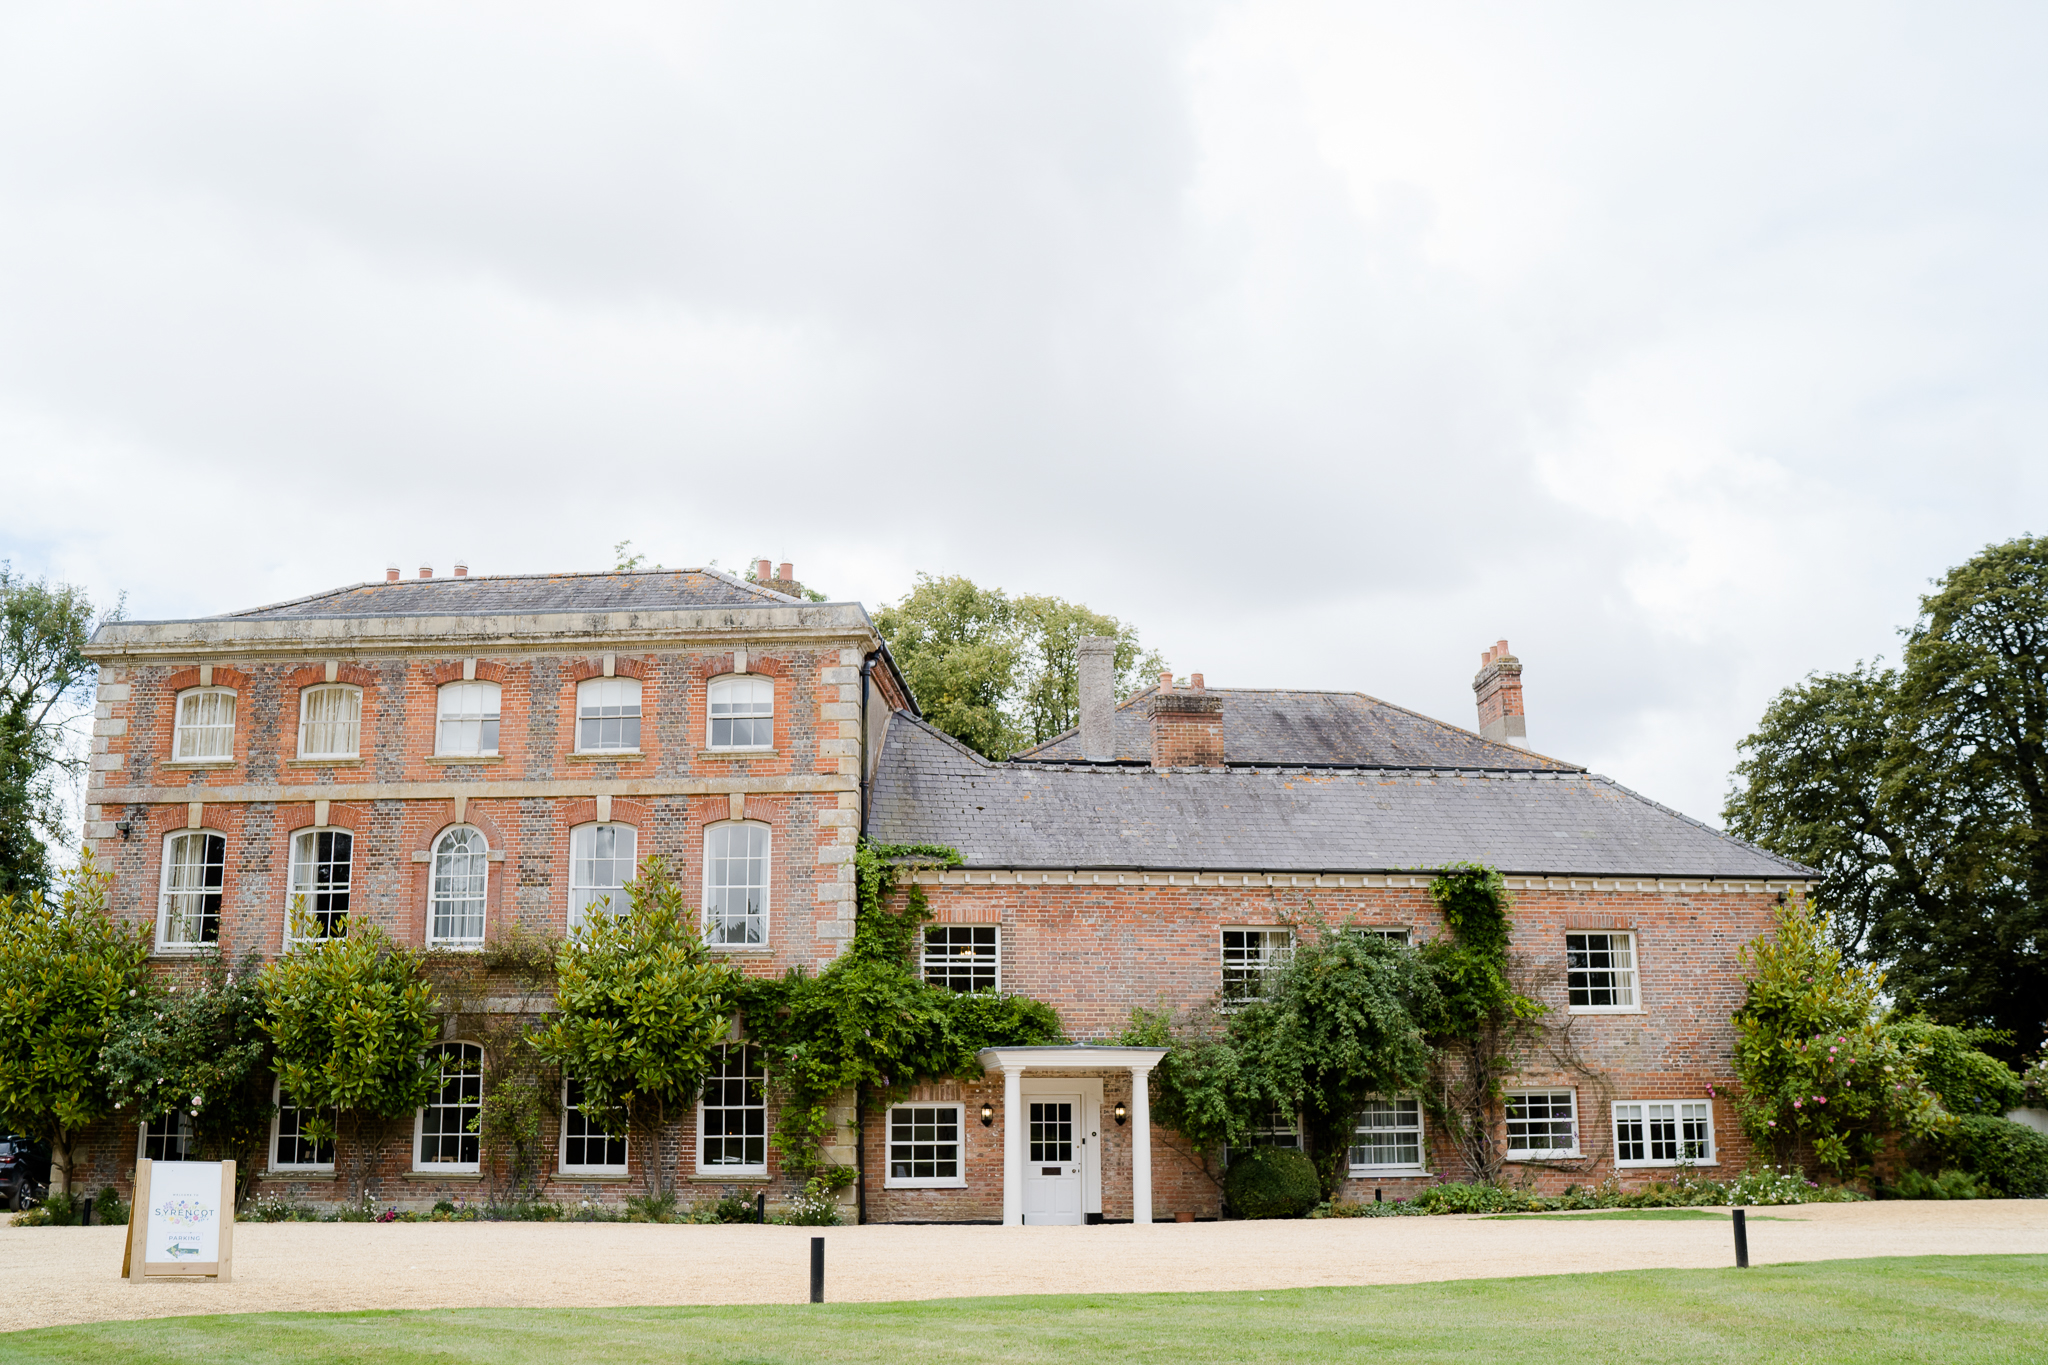 The exterior of Syrencot House wedding venue near Salisbury Wiltshire